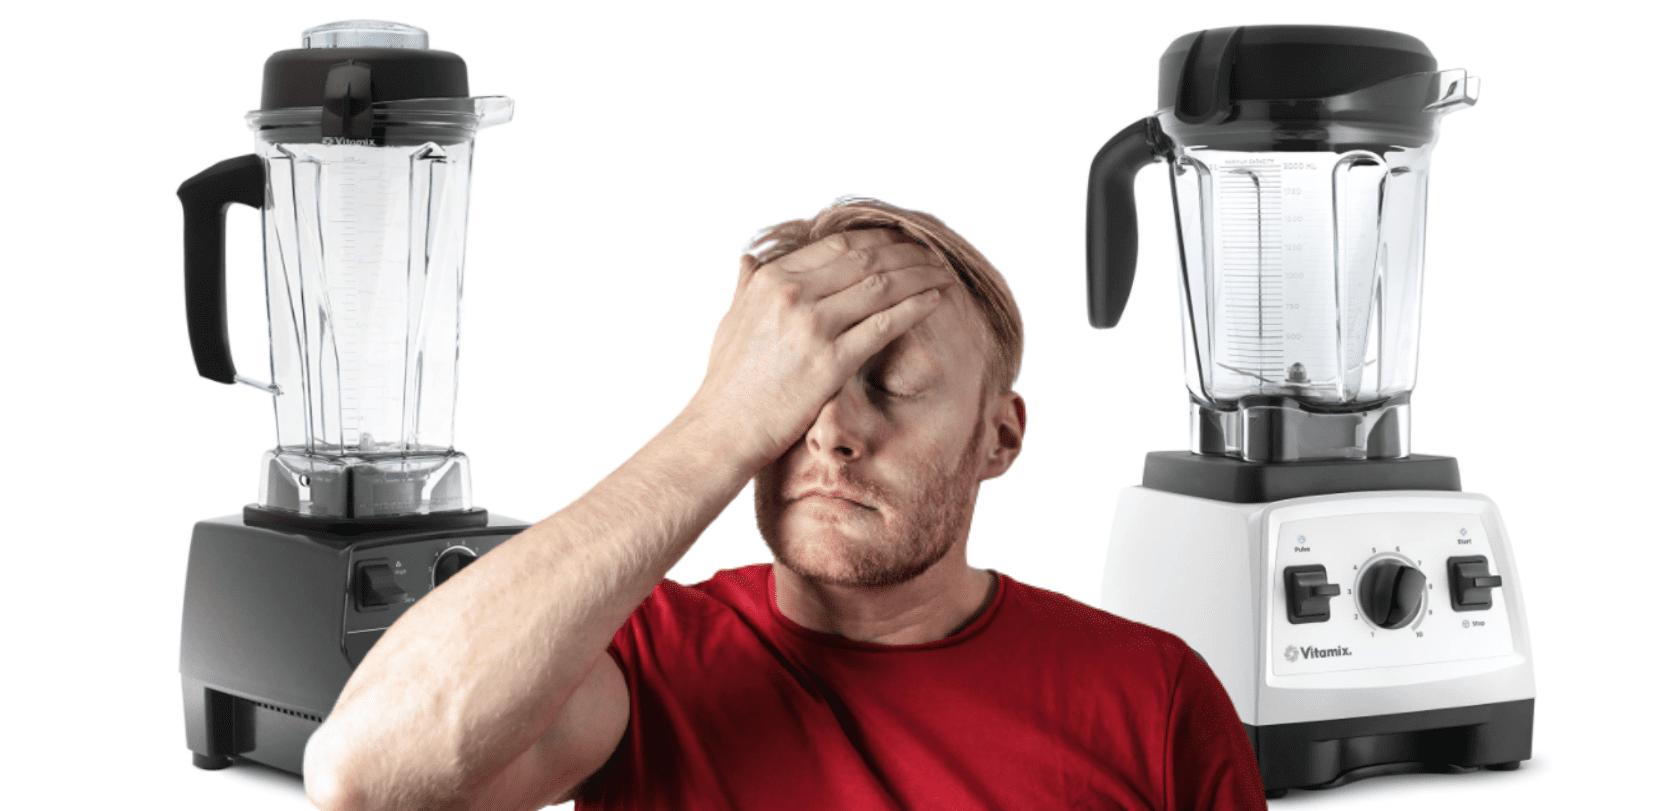 Vitamix 5200 vs. 7500 - which blender to buy?